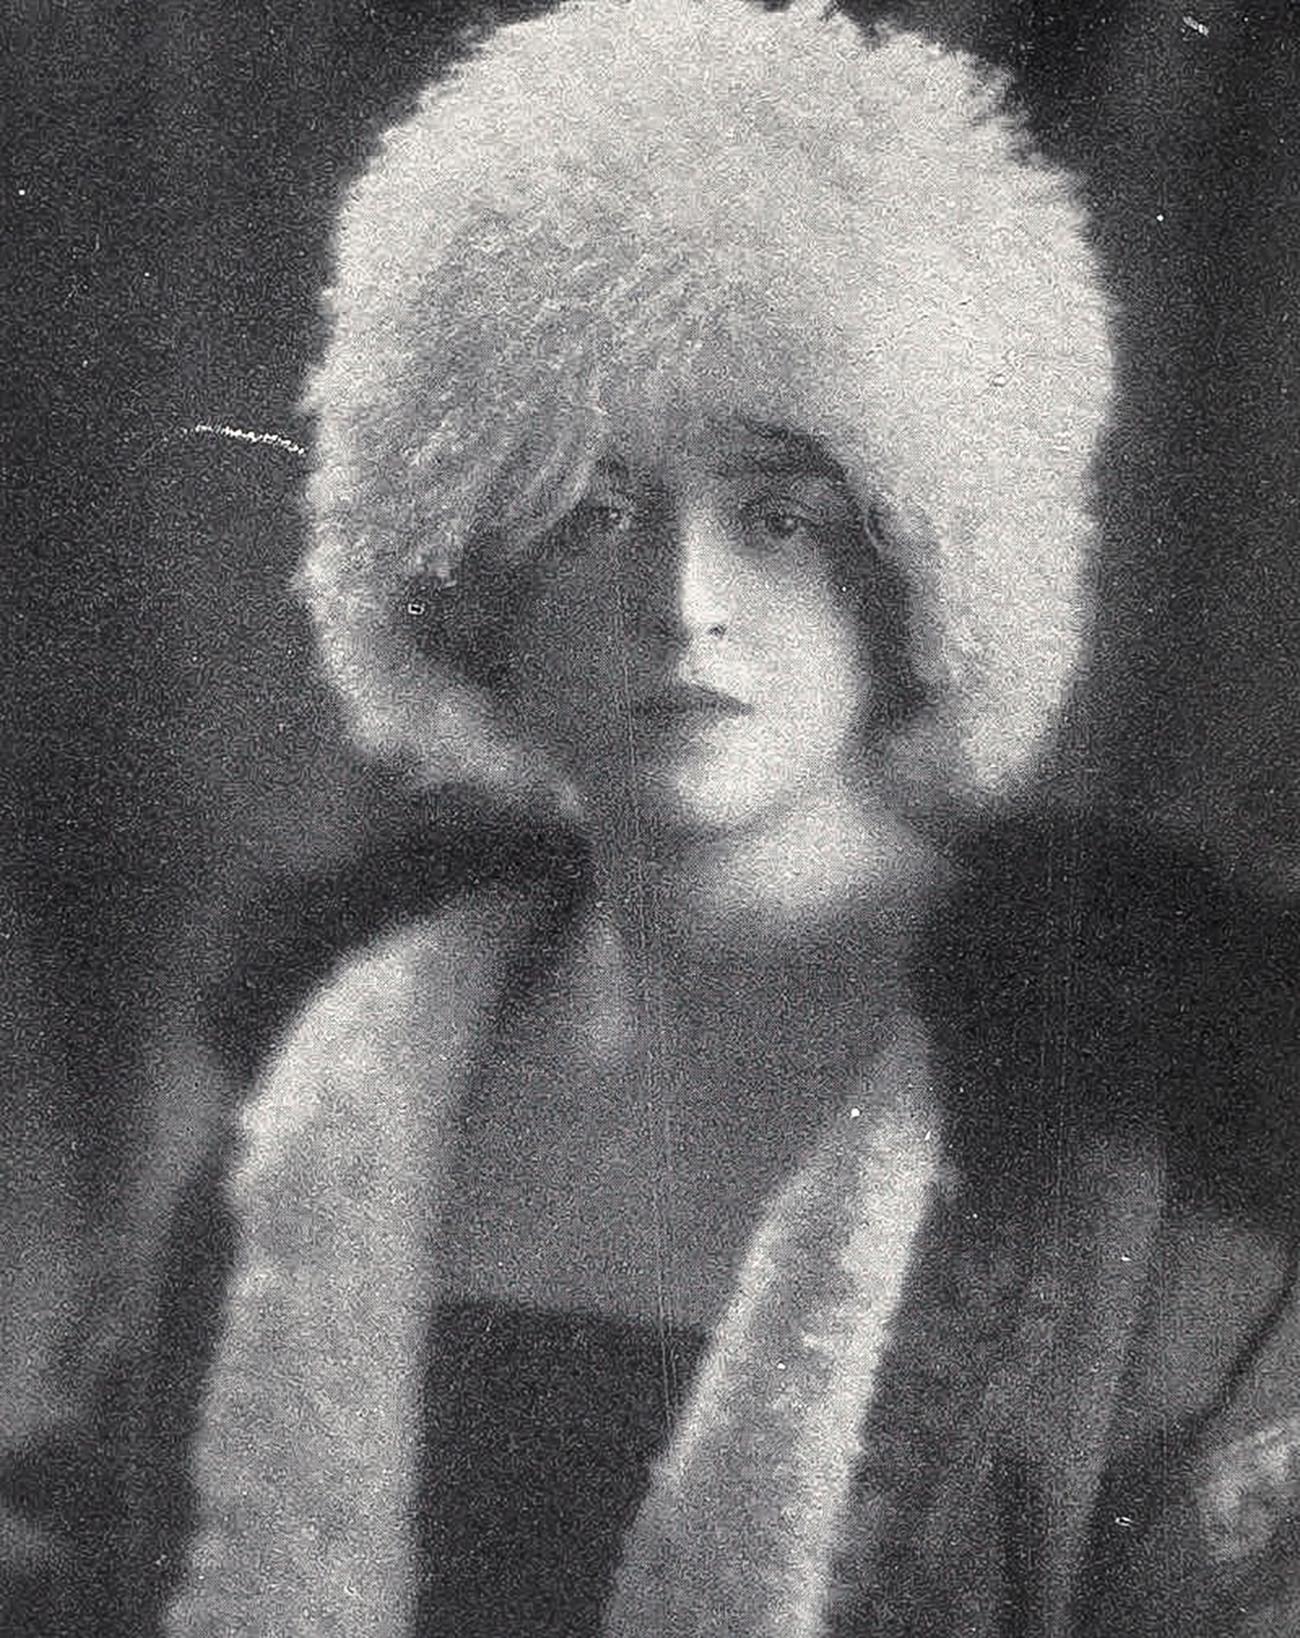 Clare Frewen Sheridan